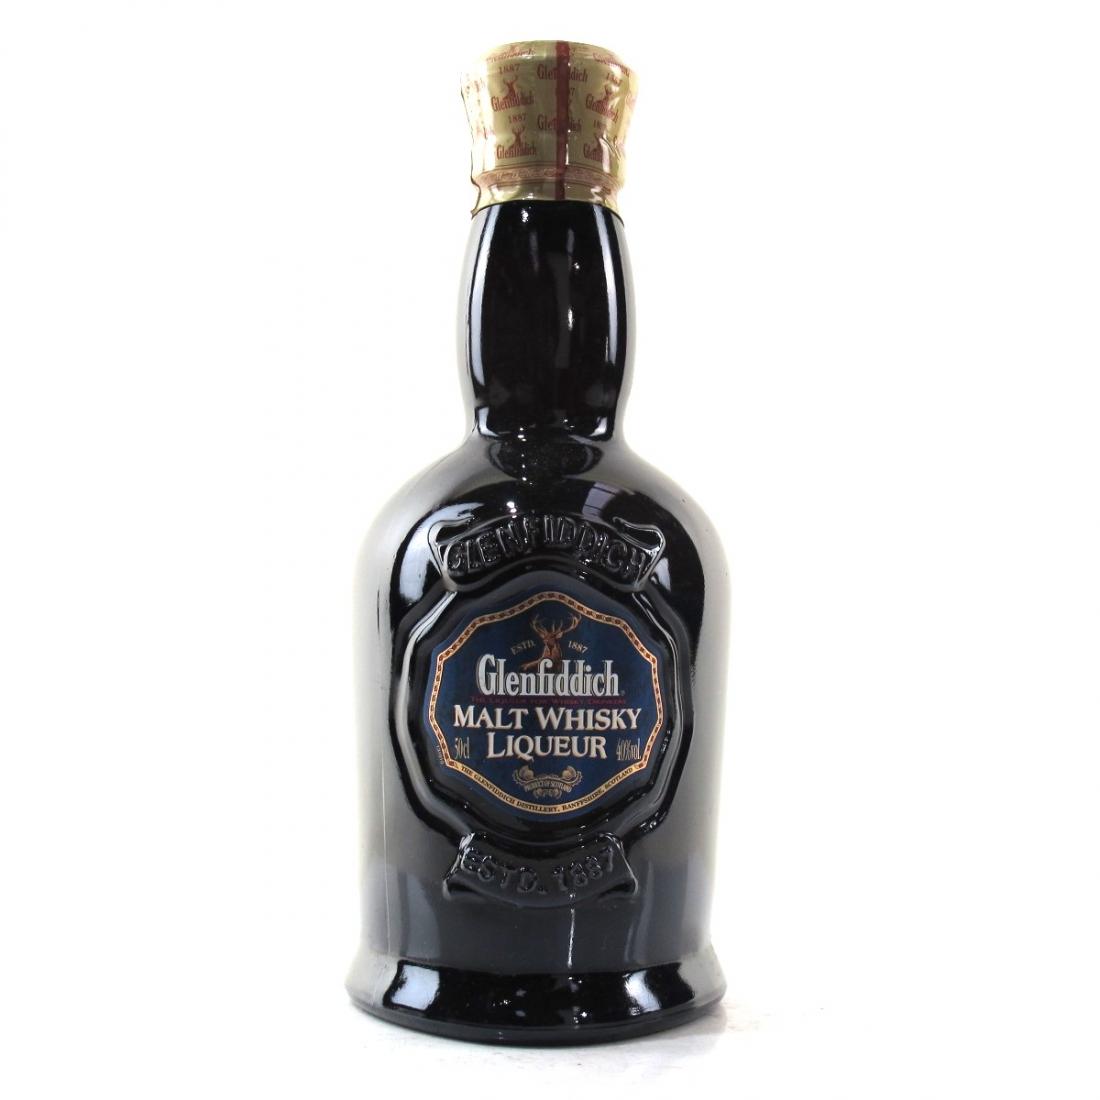 Glenfiddich Malt Whisky Liqueur 50cl